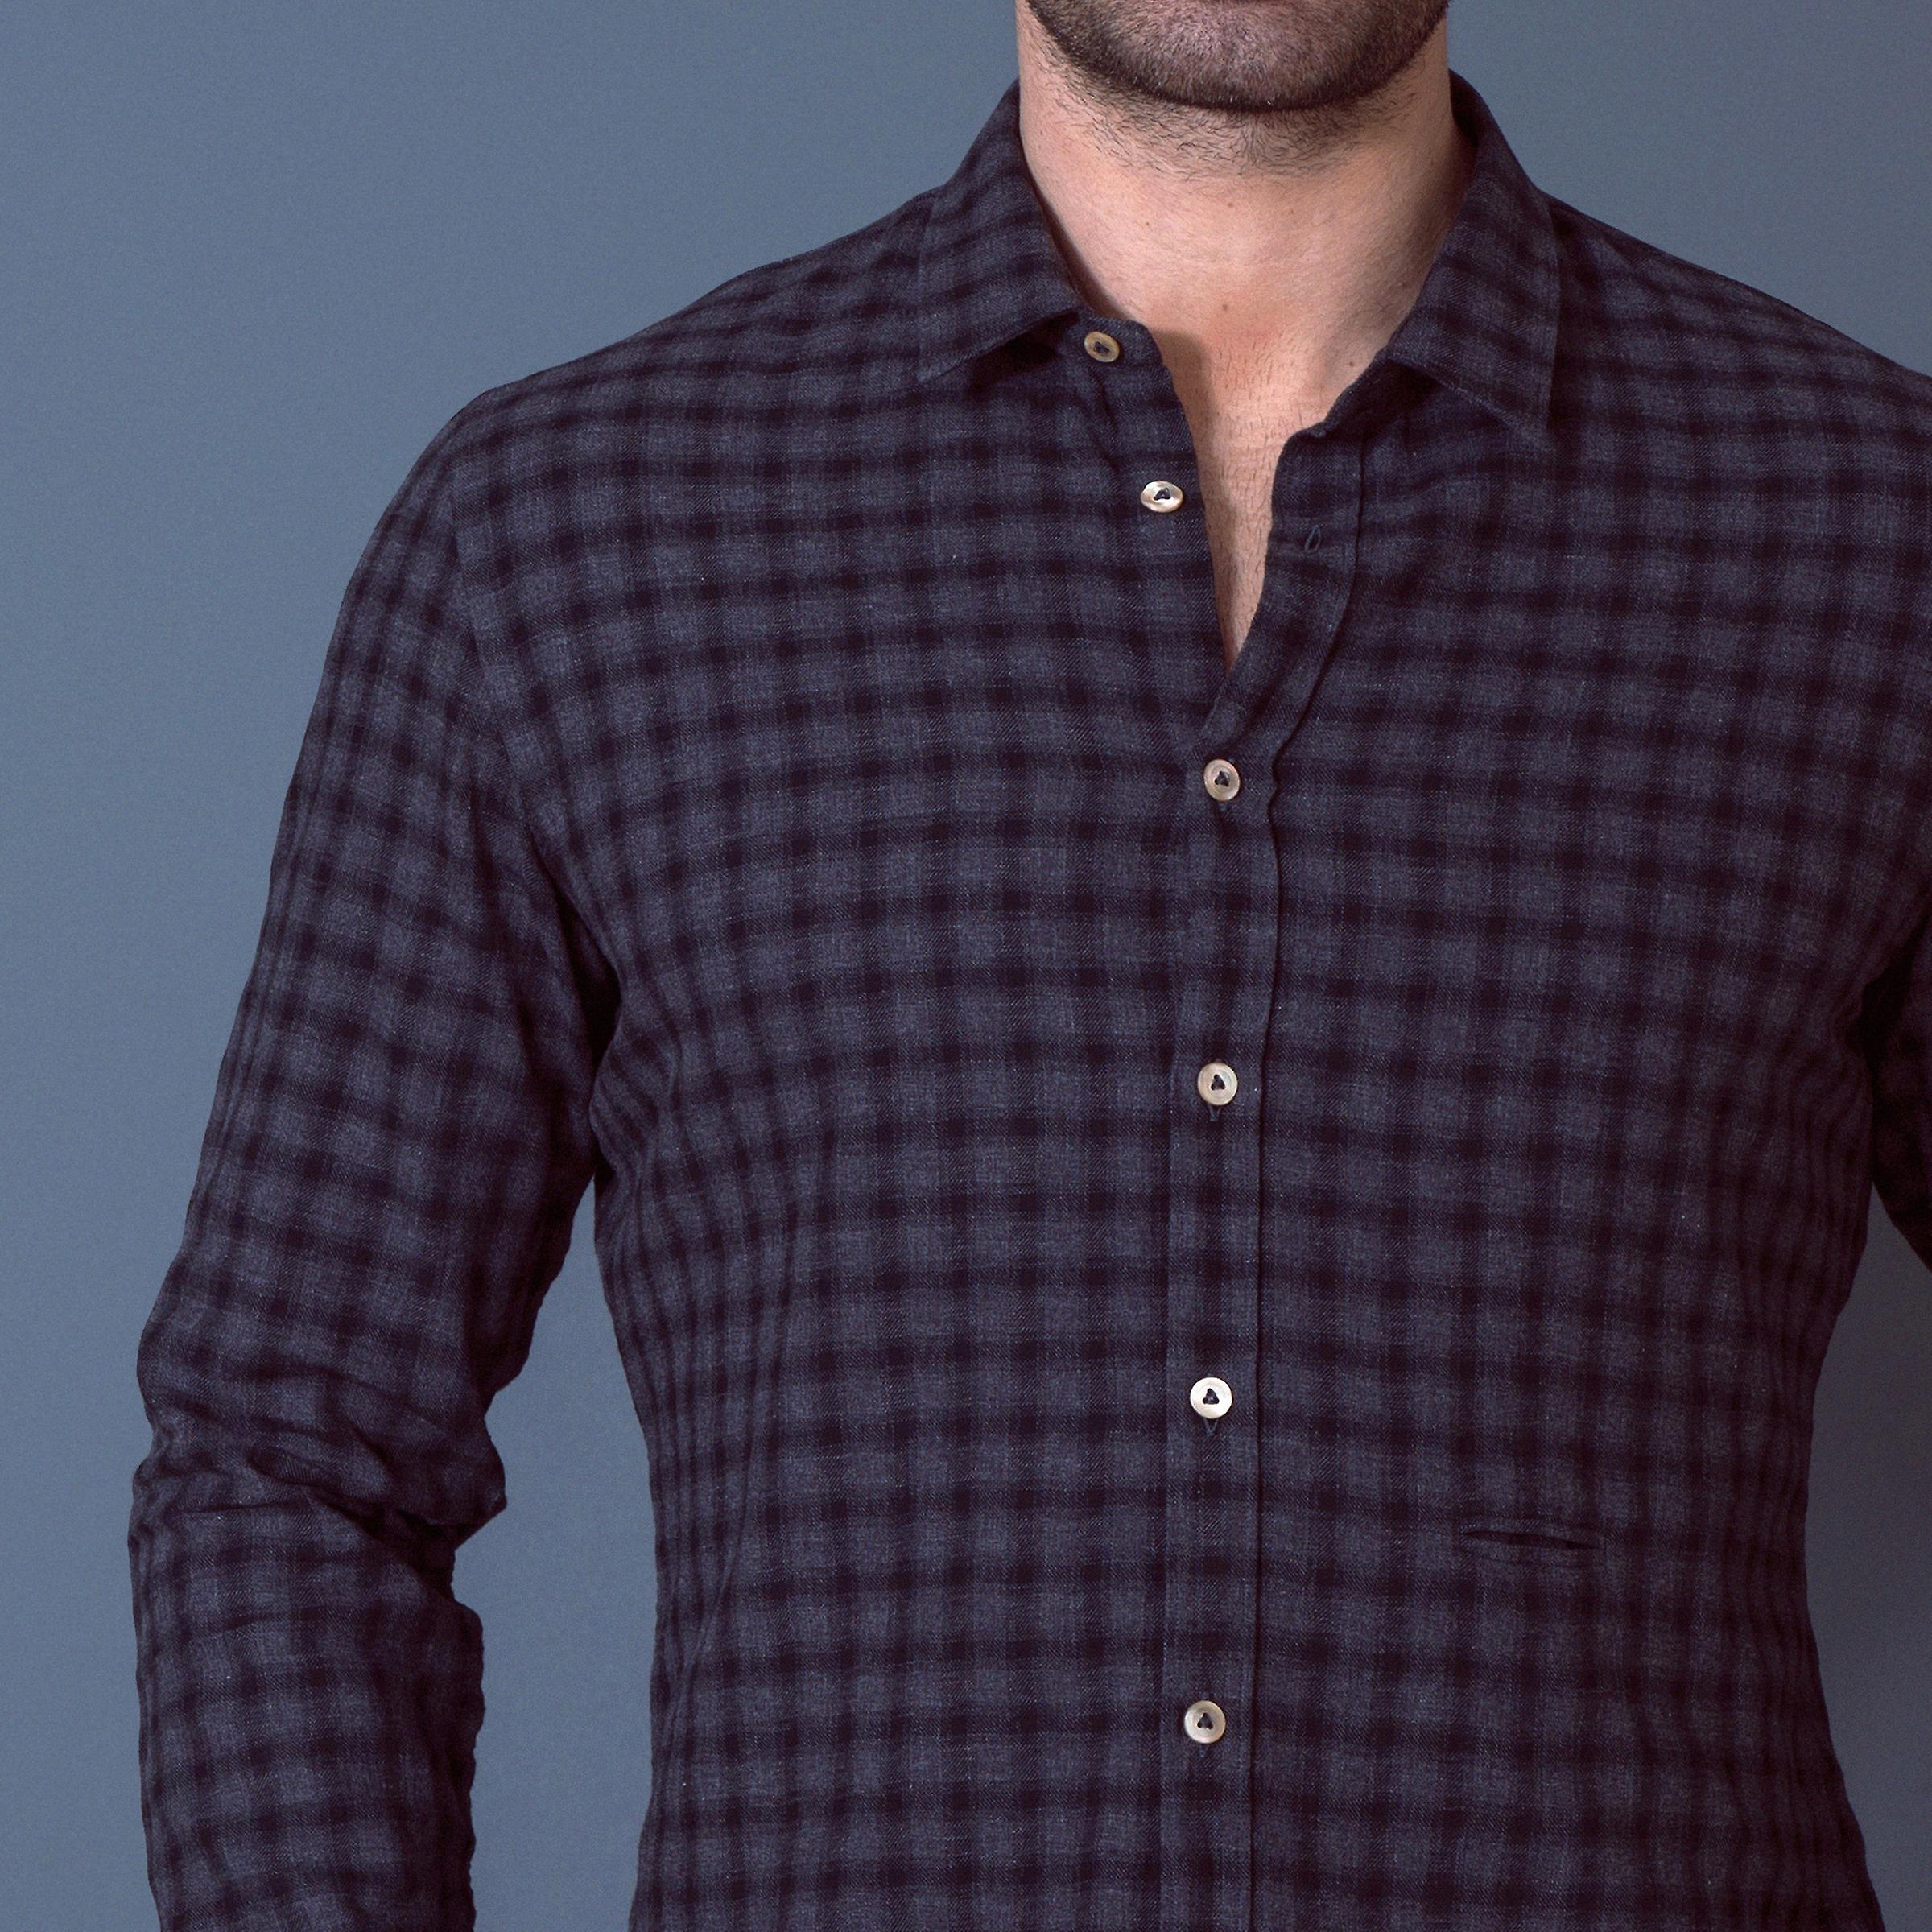 Fabio Giovanni Palermo Shirt - Lightweight Cotton Stylish Black & Charcoal Check Shirt